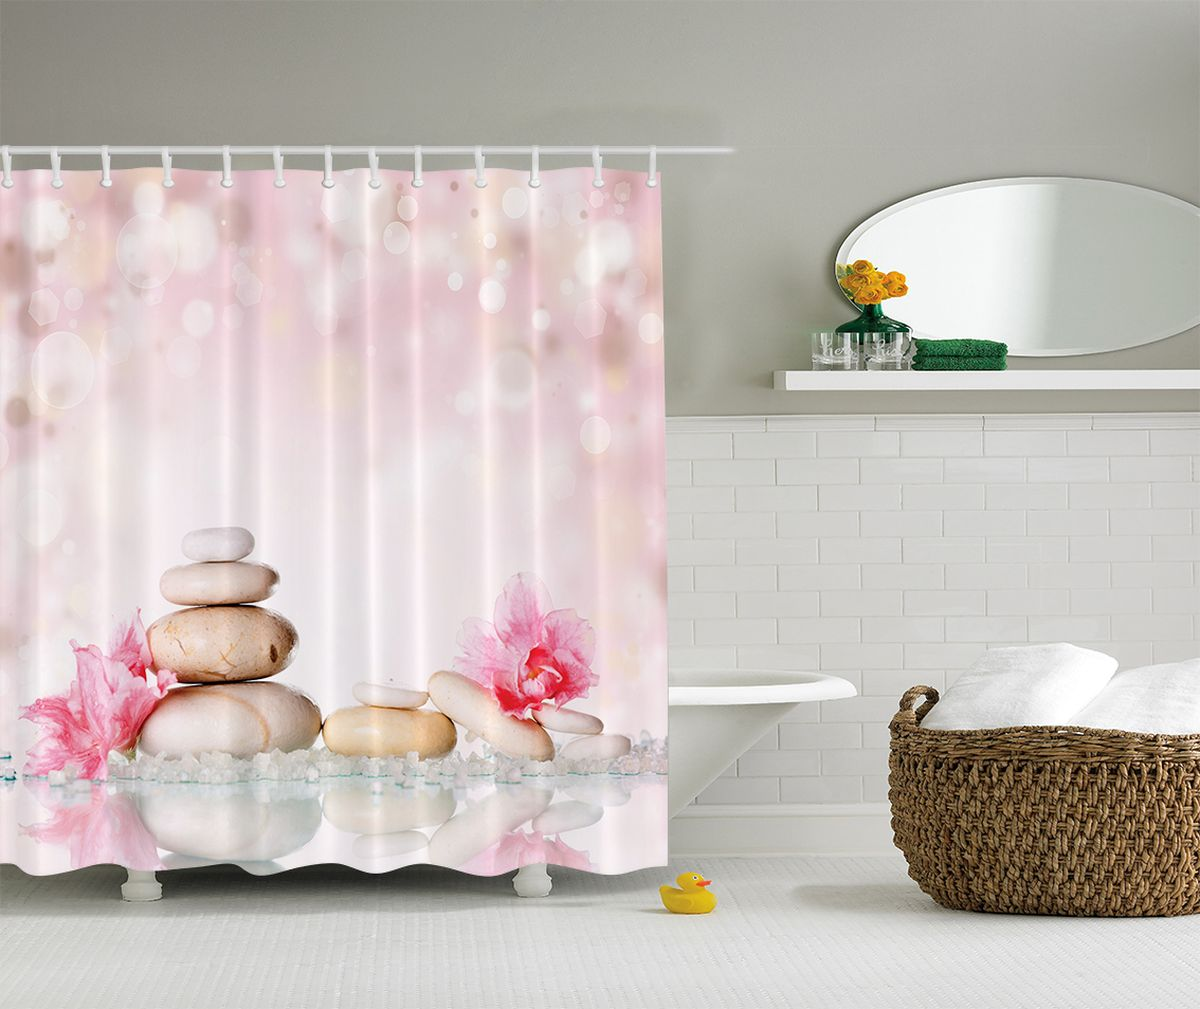 Штора для ванной комнаты Magic Lady Композиция, 180 х 200 см мужская одежда